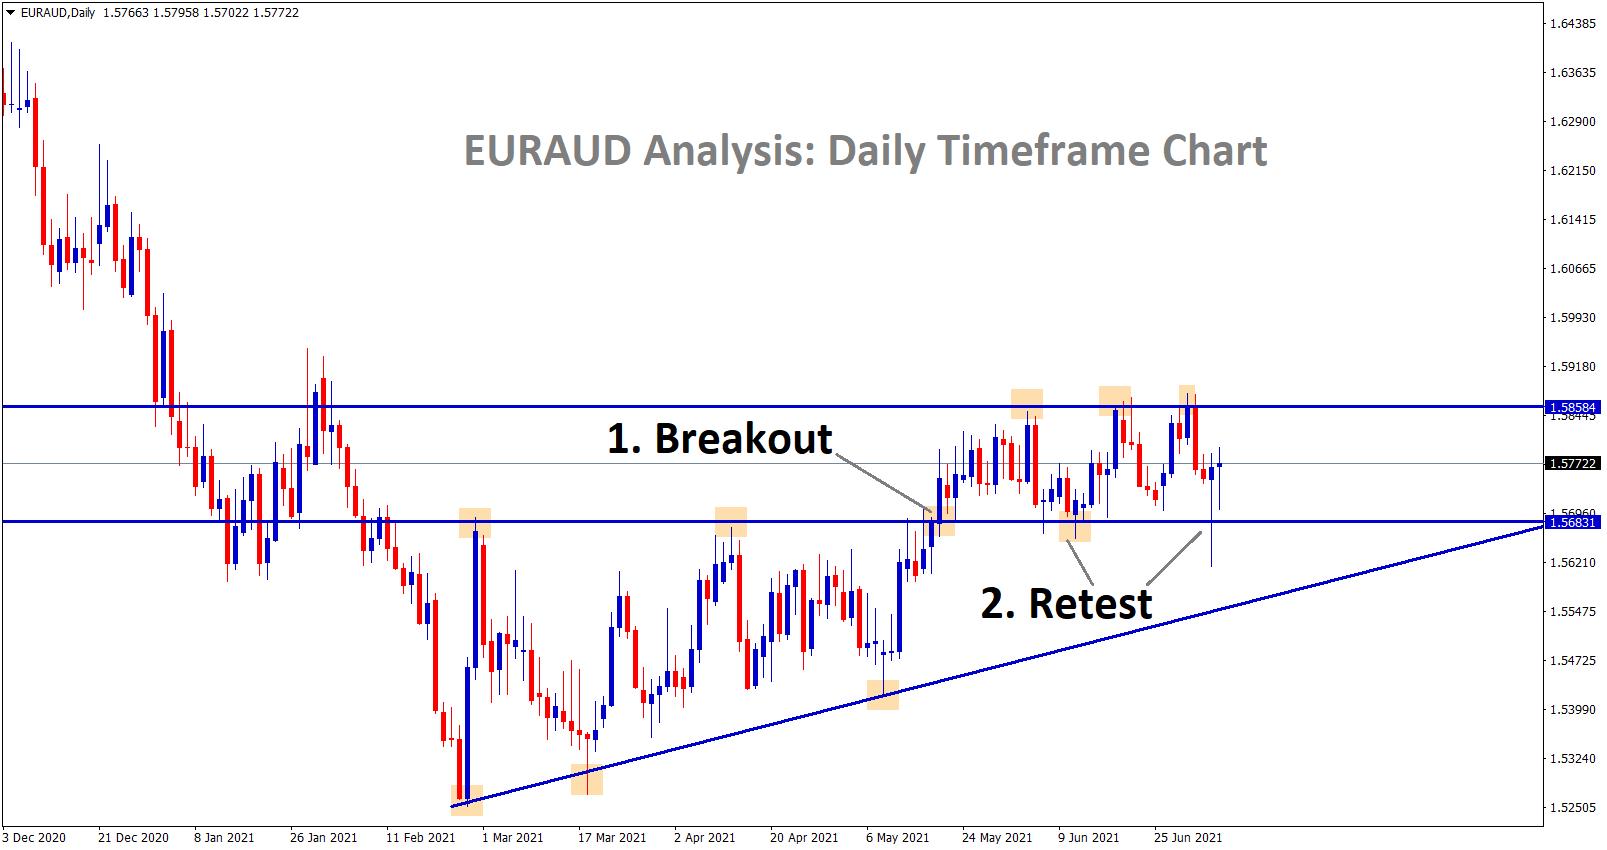 EURAUD breakout and Retest scenario happening